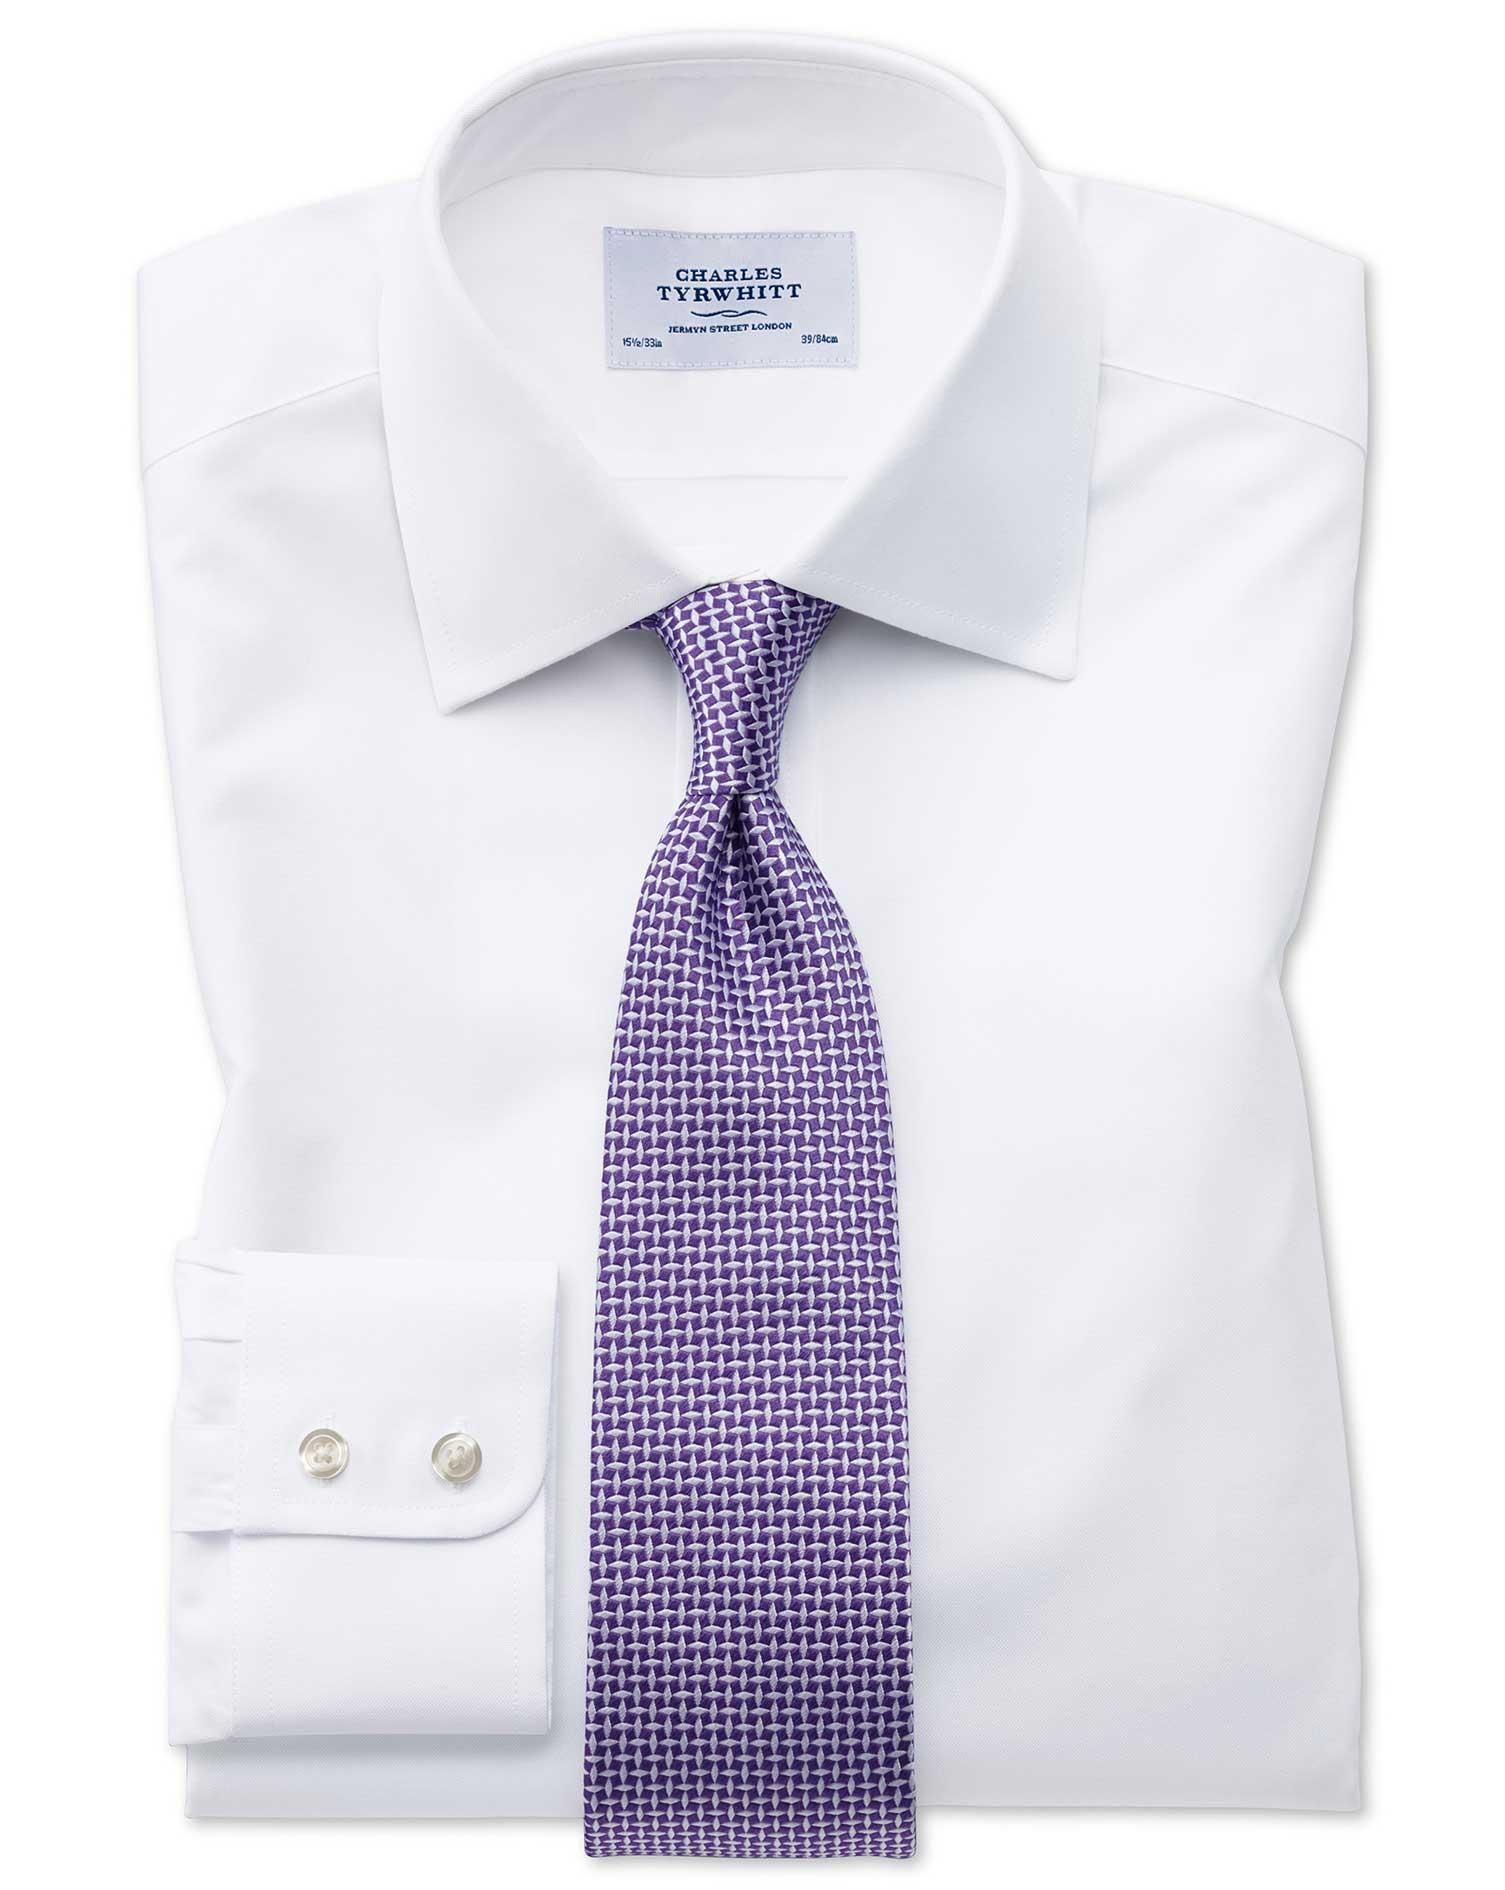 Extra Slim Fit Oxford White Shirt Charles Tyrwhitt